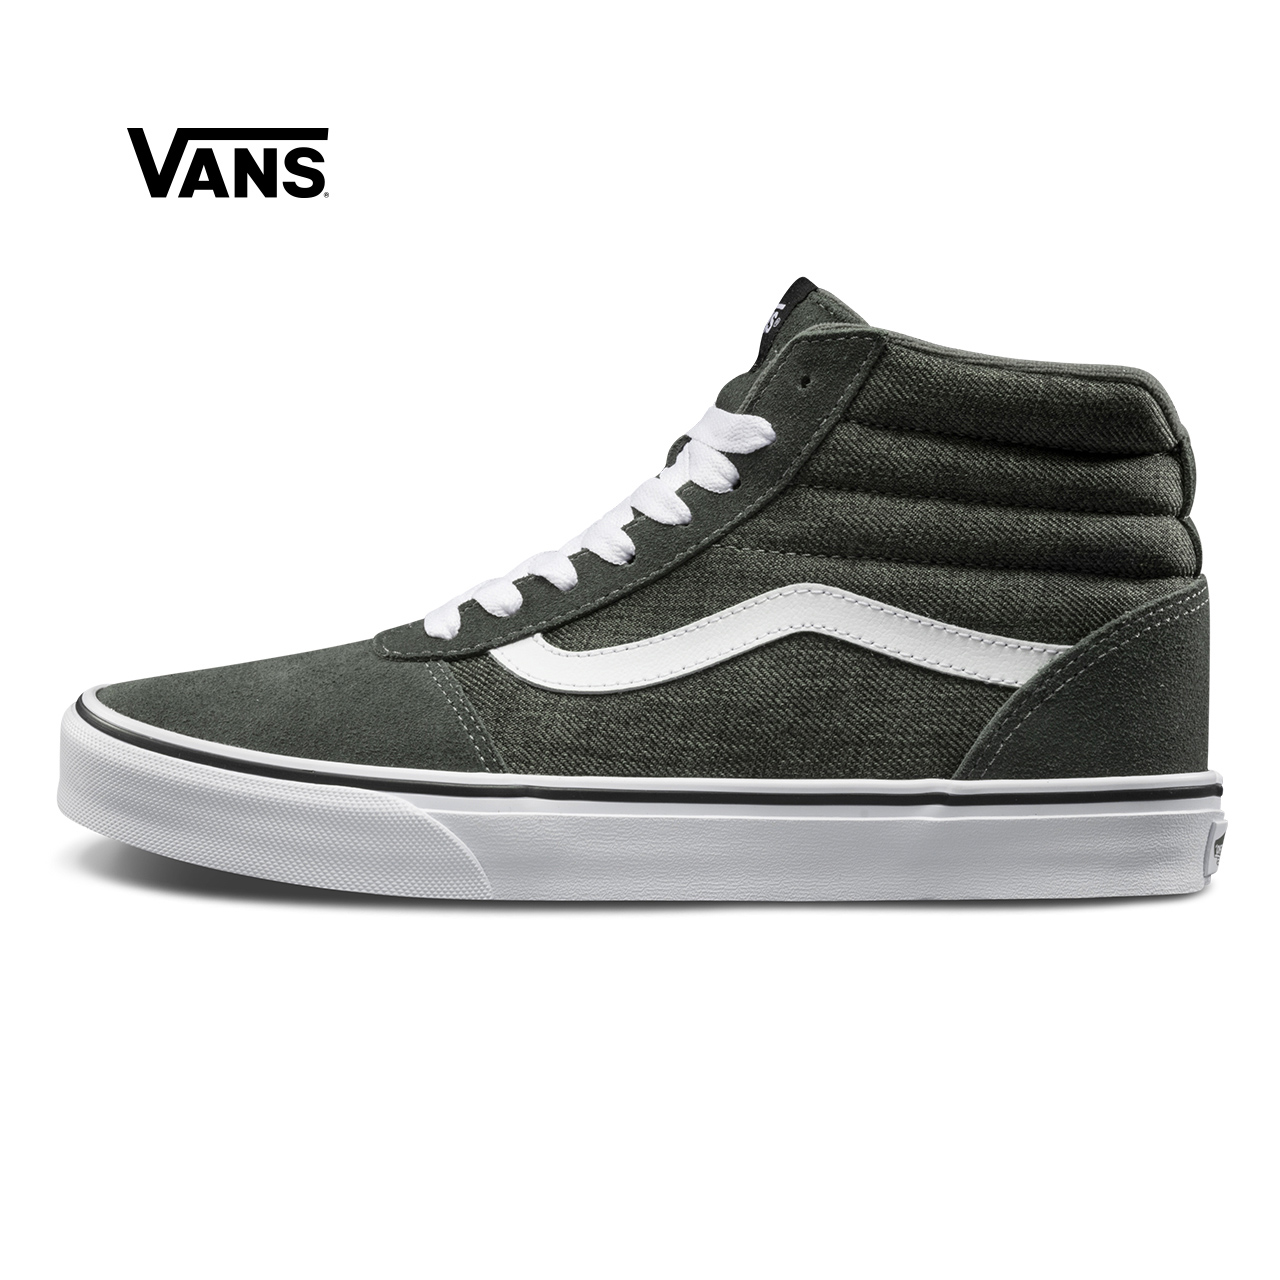 Vans 范斯官方男款侧边条纹休闲鞋|VN0A36ENQOR